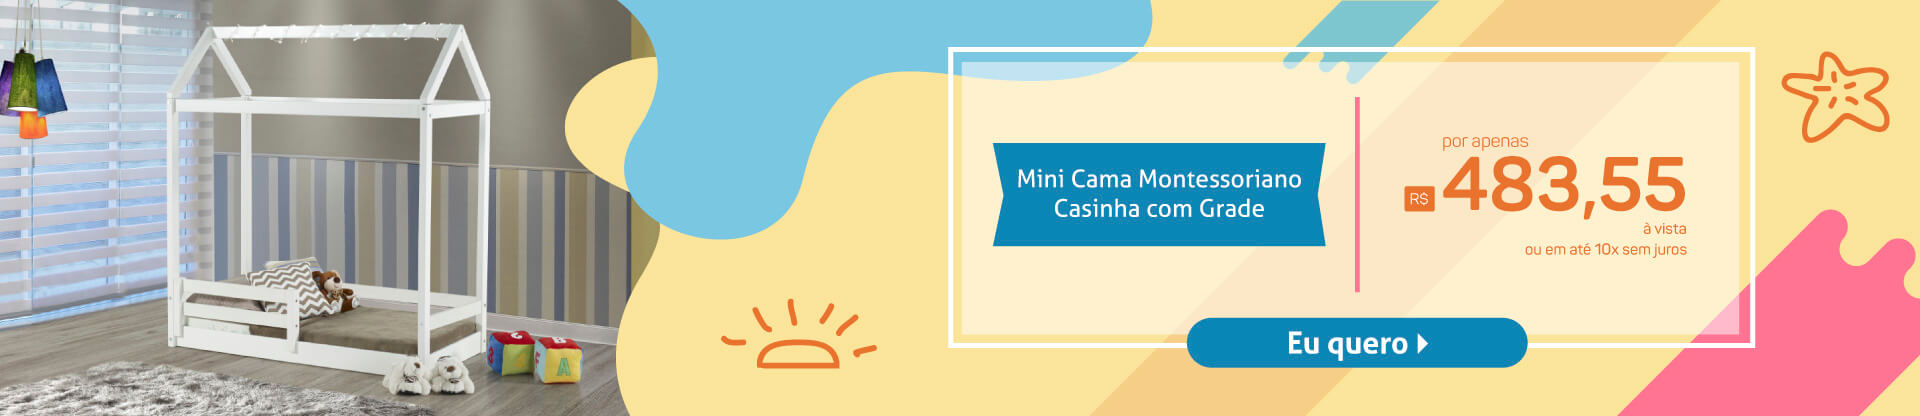 Banner Montessoriano Casinha